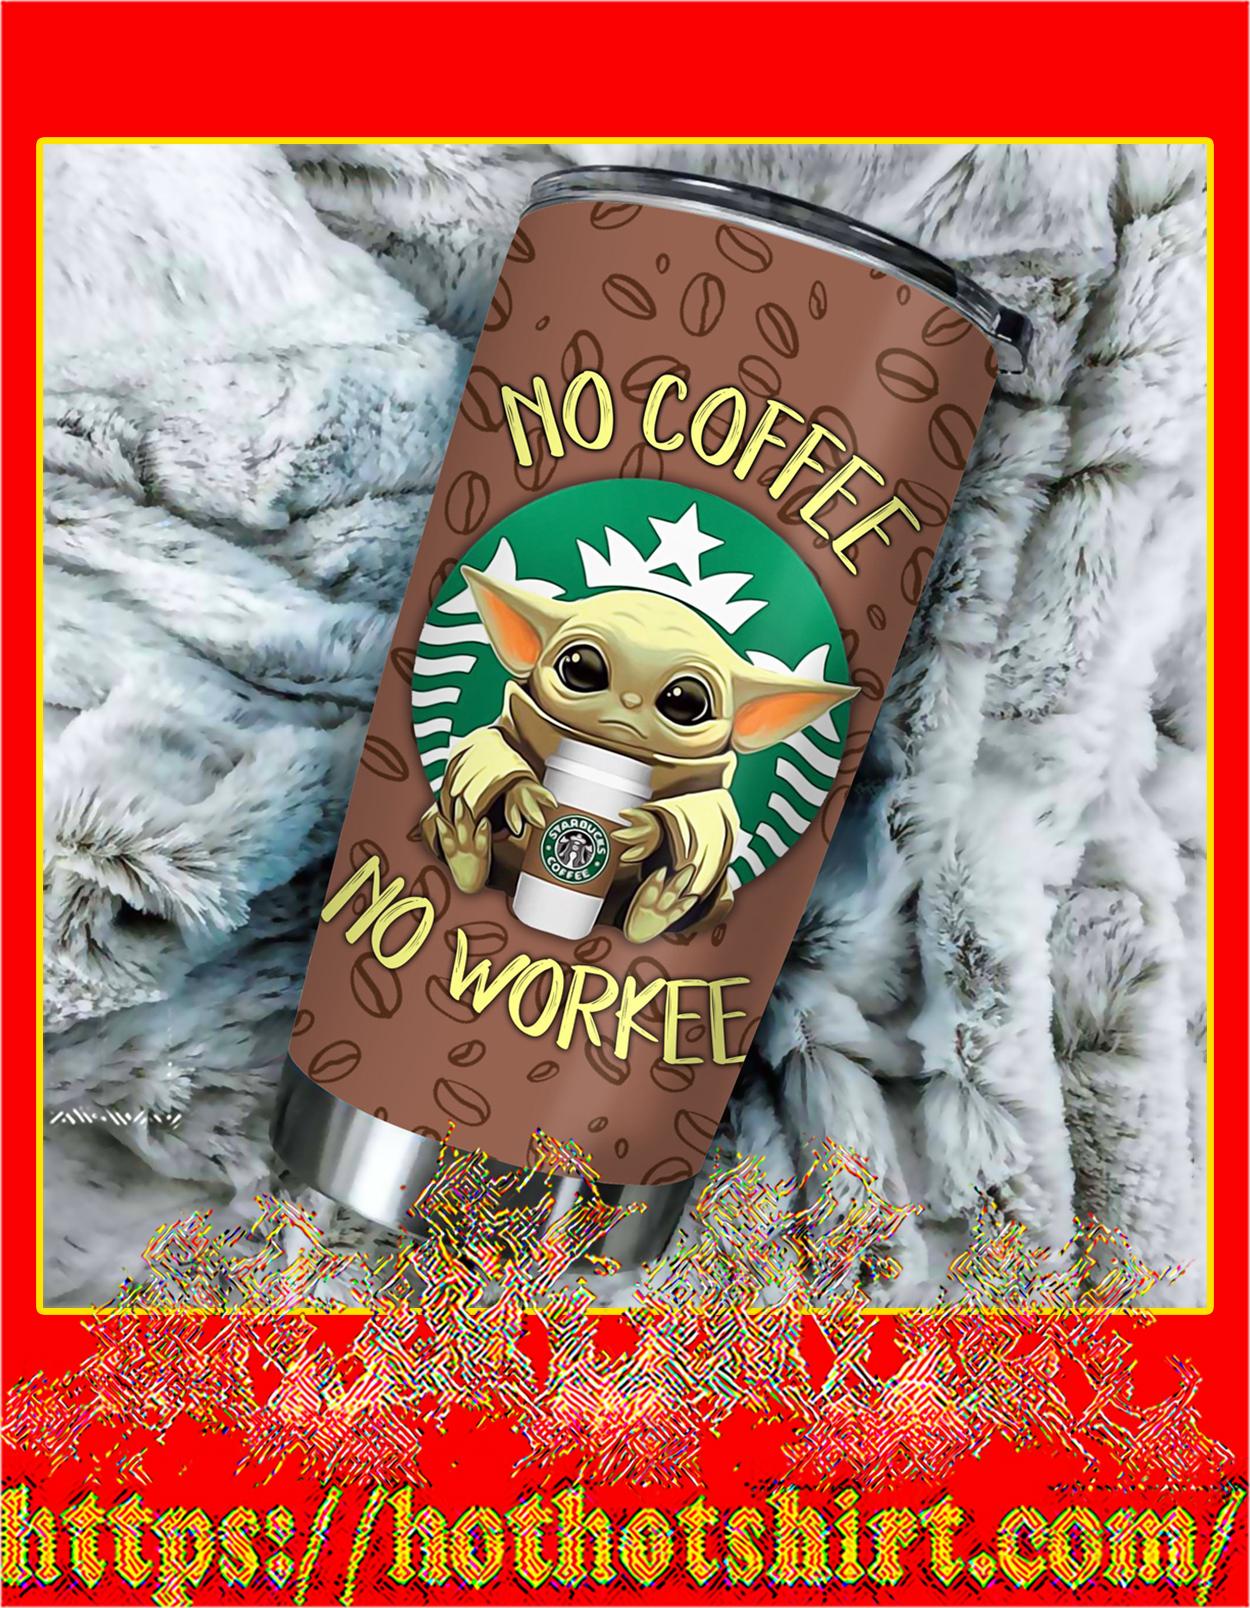 Baby yoda no coffee no workee tumbler - pic 1